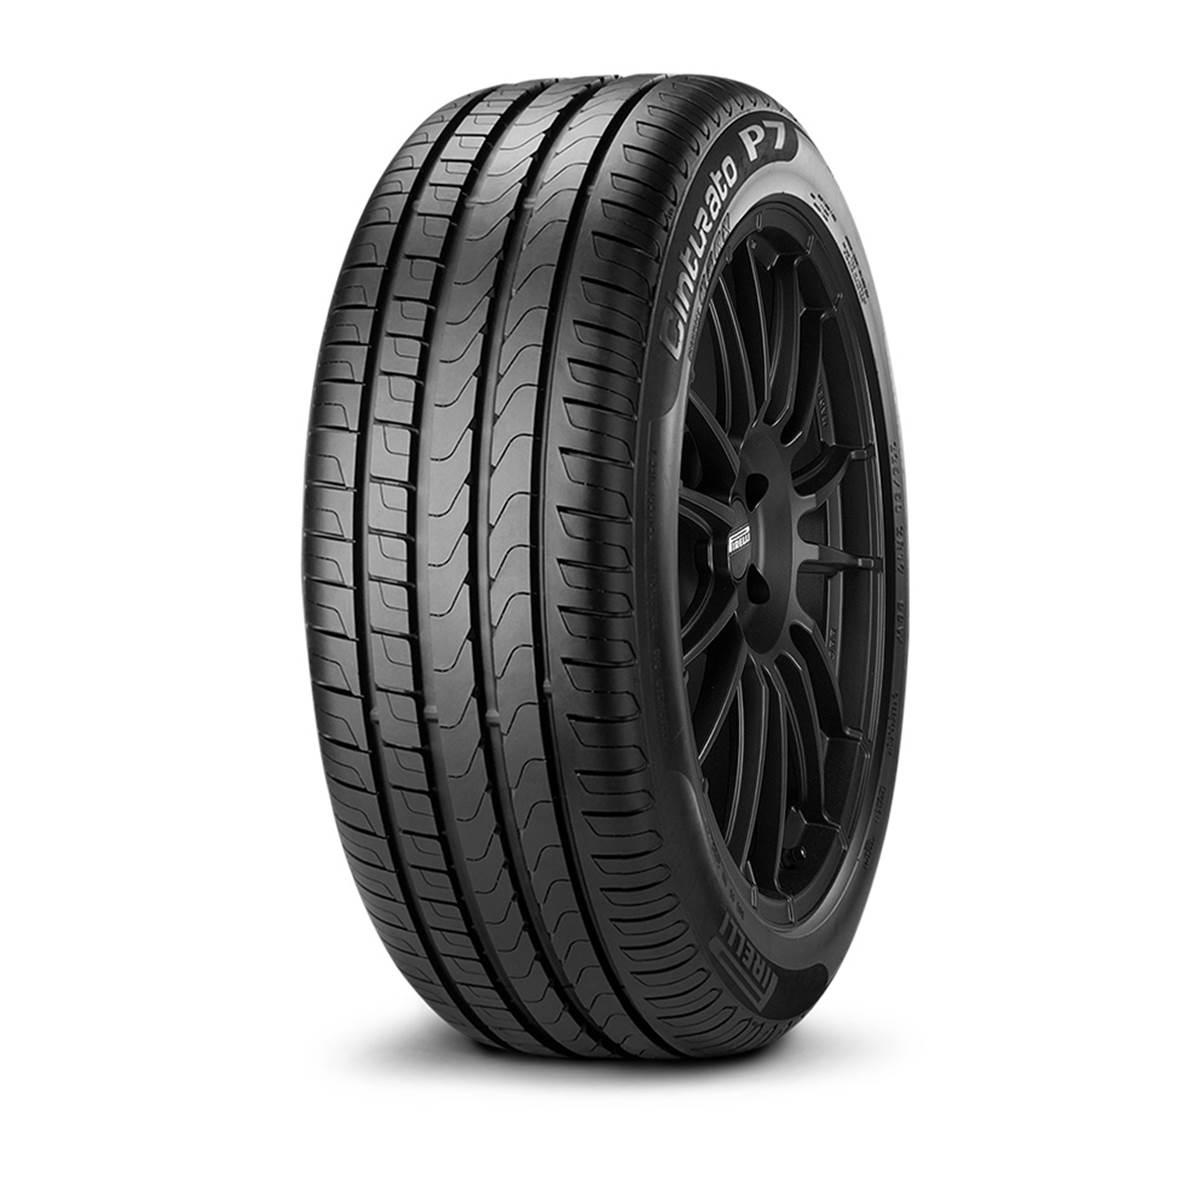 Pneu Pirelli 225/45R17 91V Cinturato P7